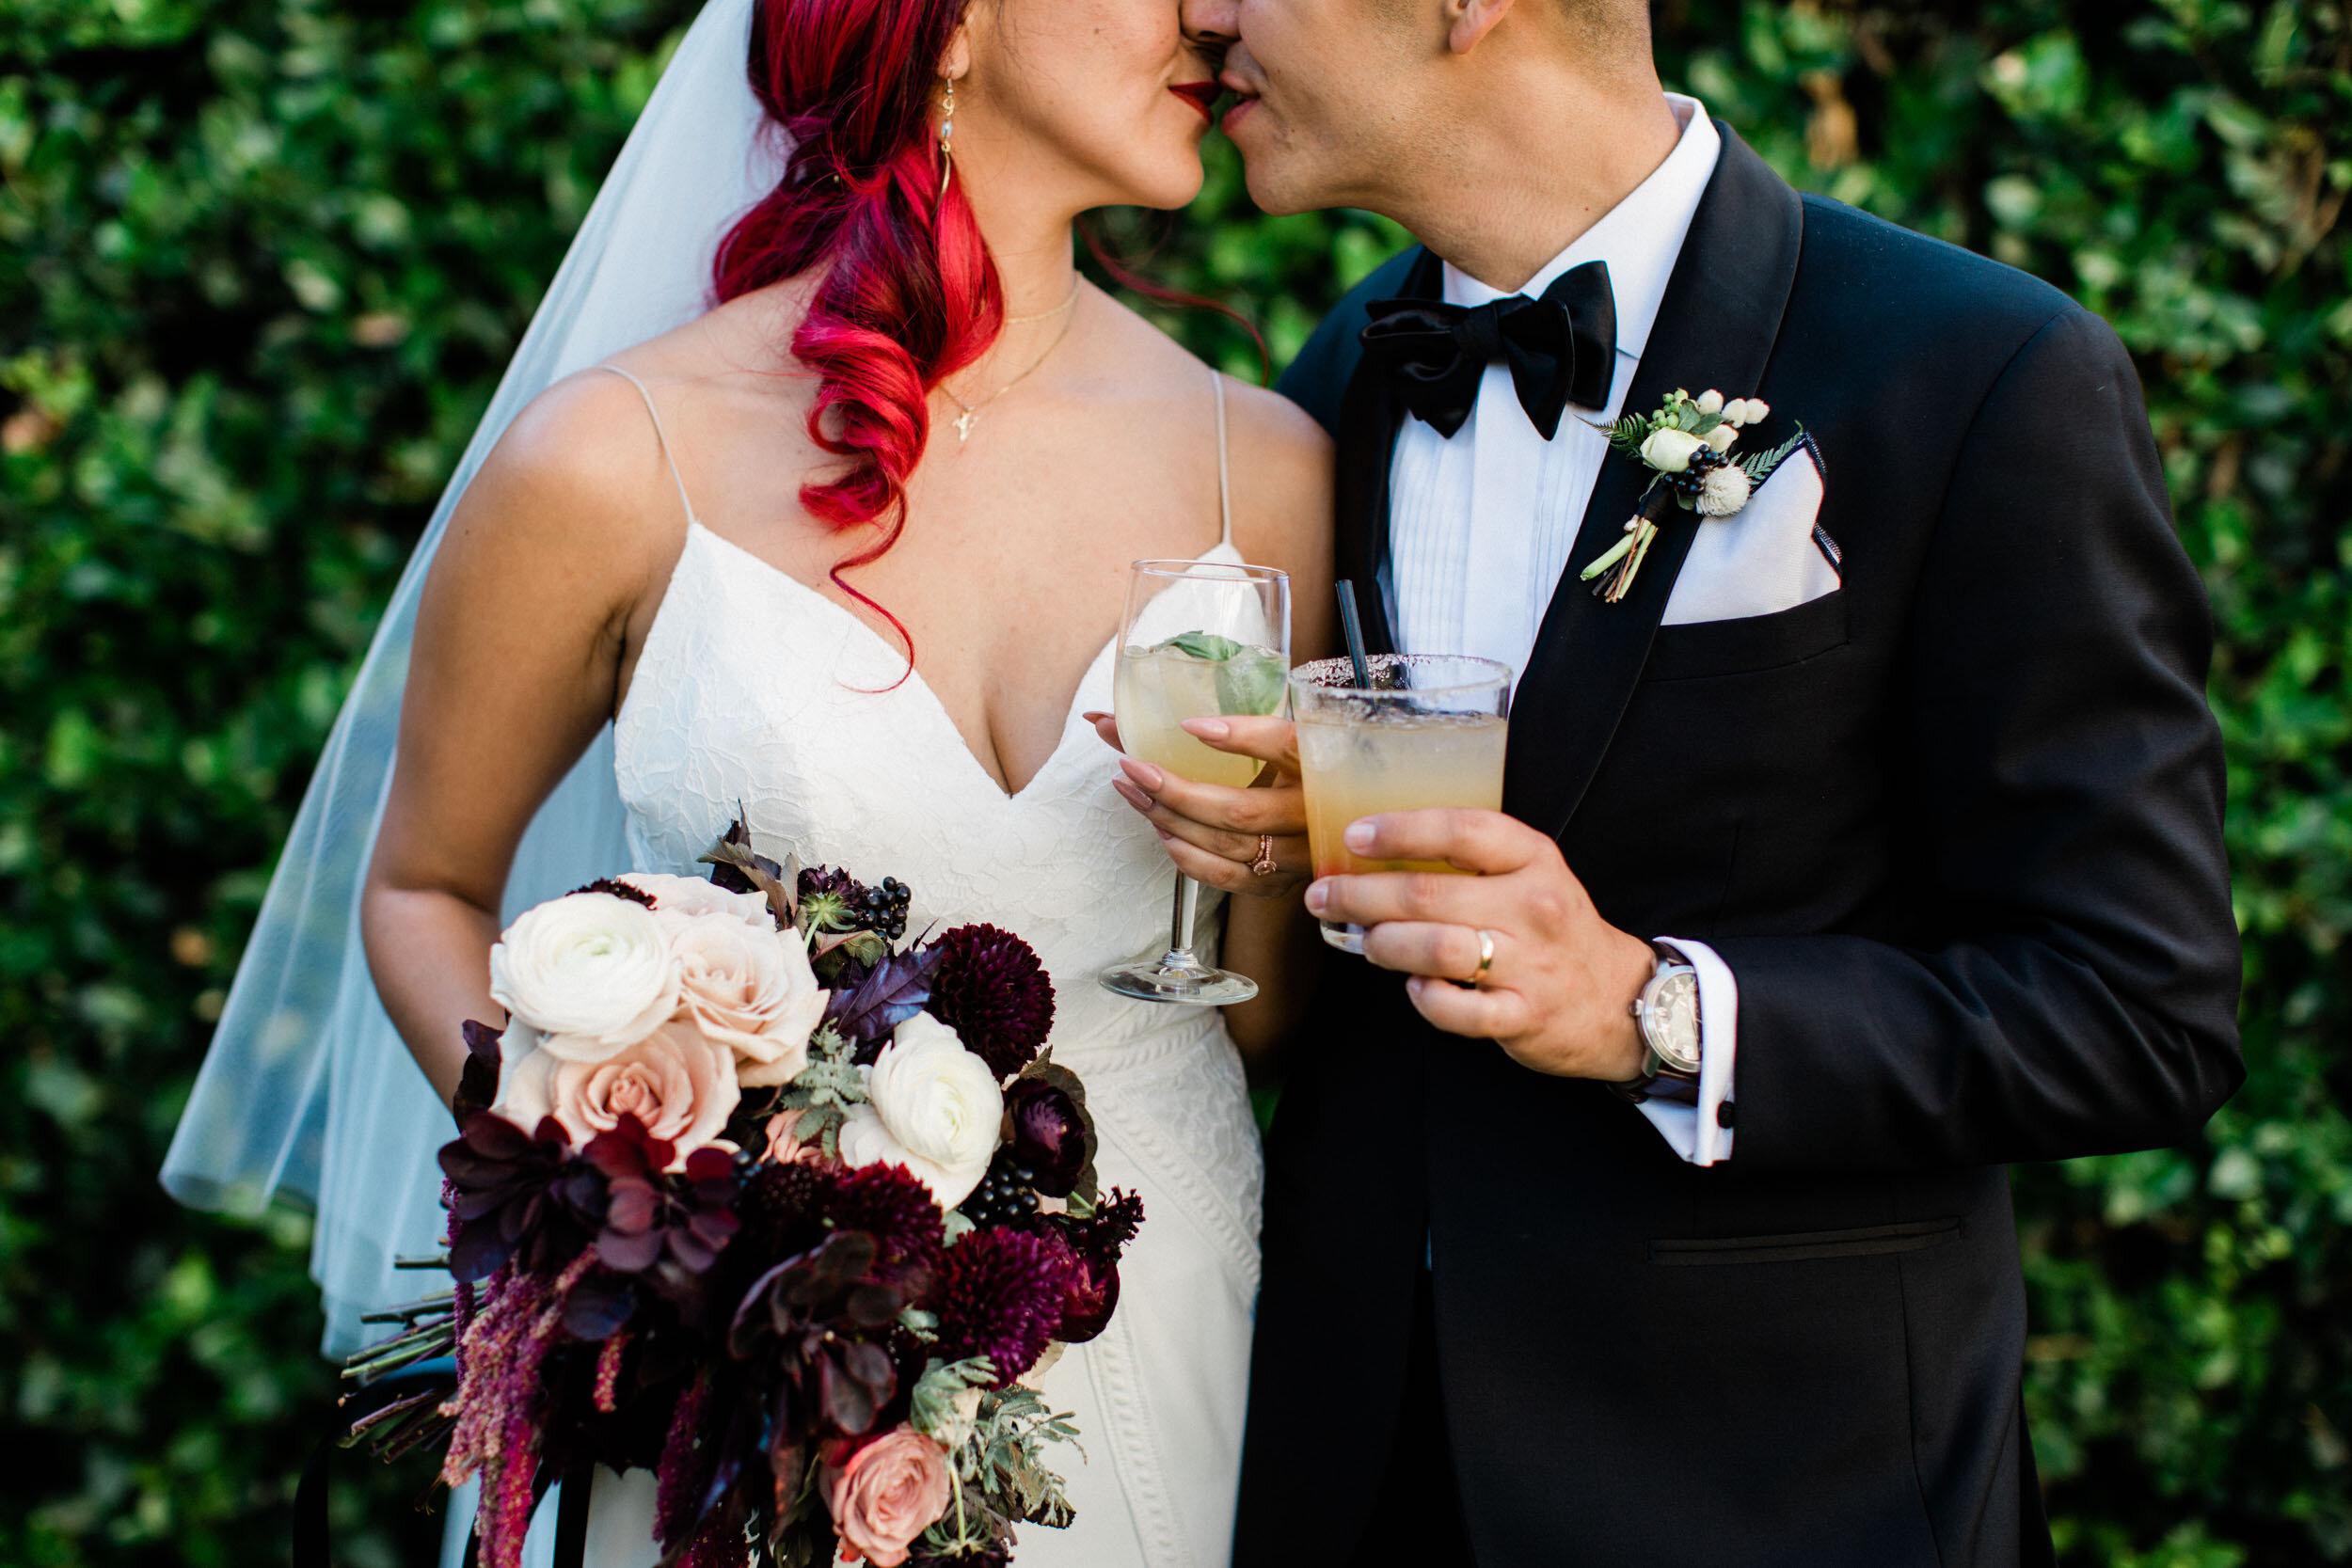 BKM-Photography-Los-Angeles-Highland-Park-York-Manor-Wedding-Photography-0830.jpg